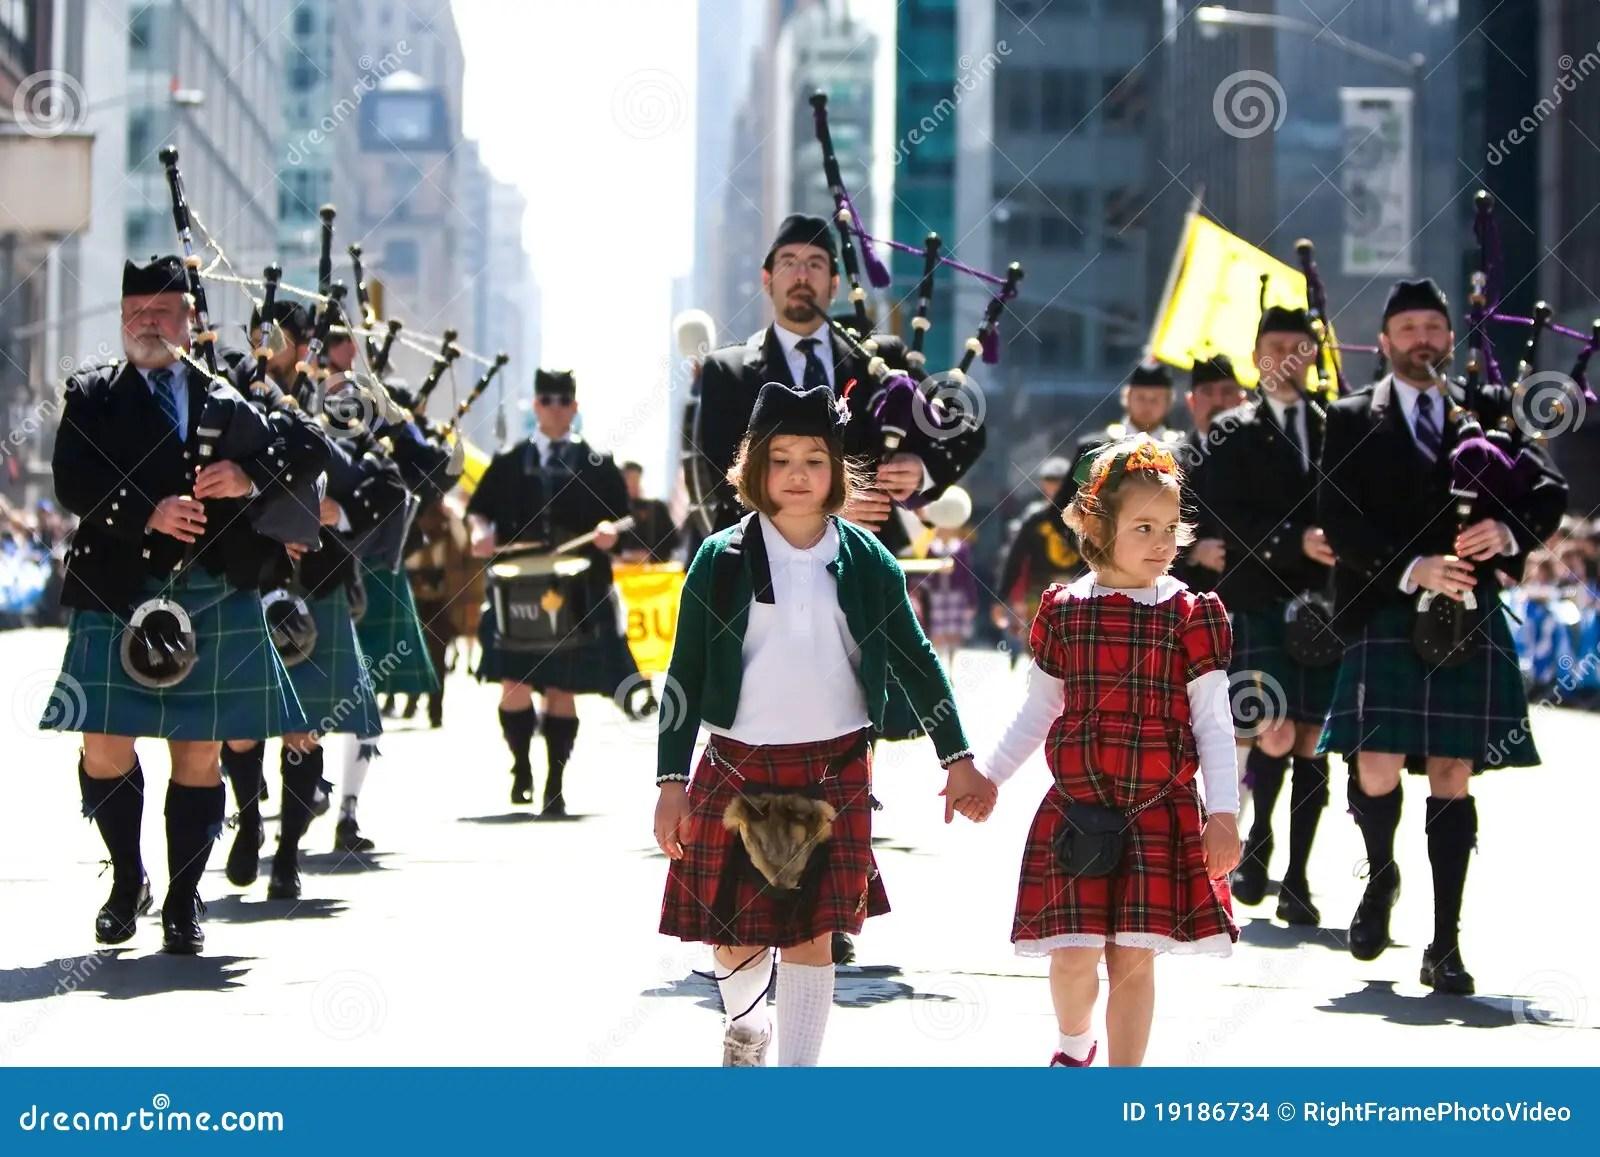 Scottish Bagpipe Band Editorial Stock Image Image Of Blue